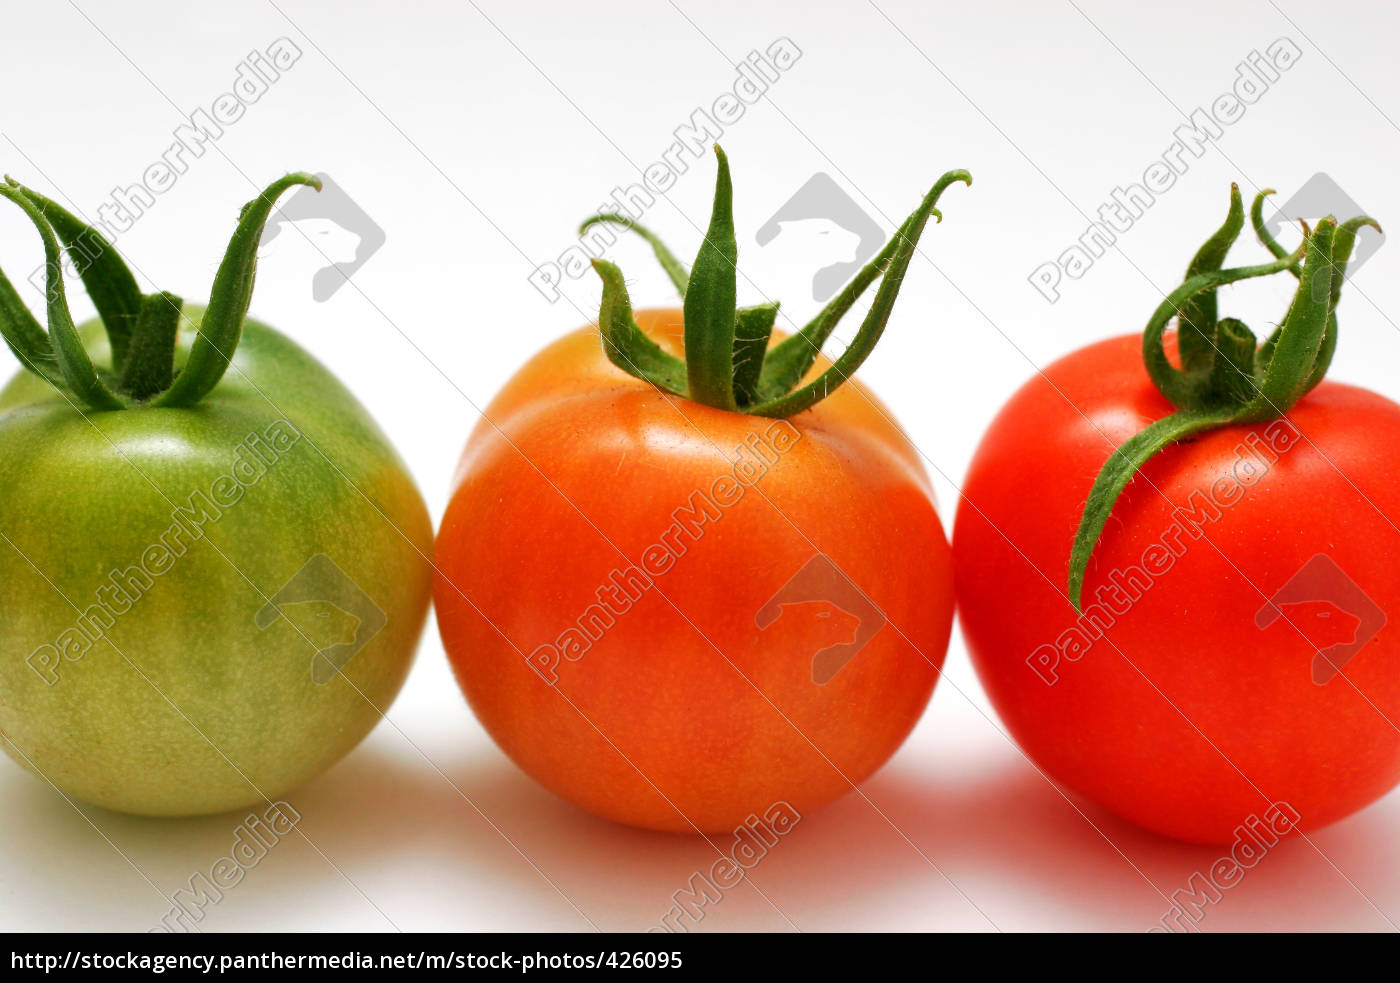 tomatoes - 426095